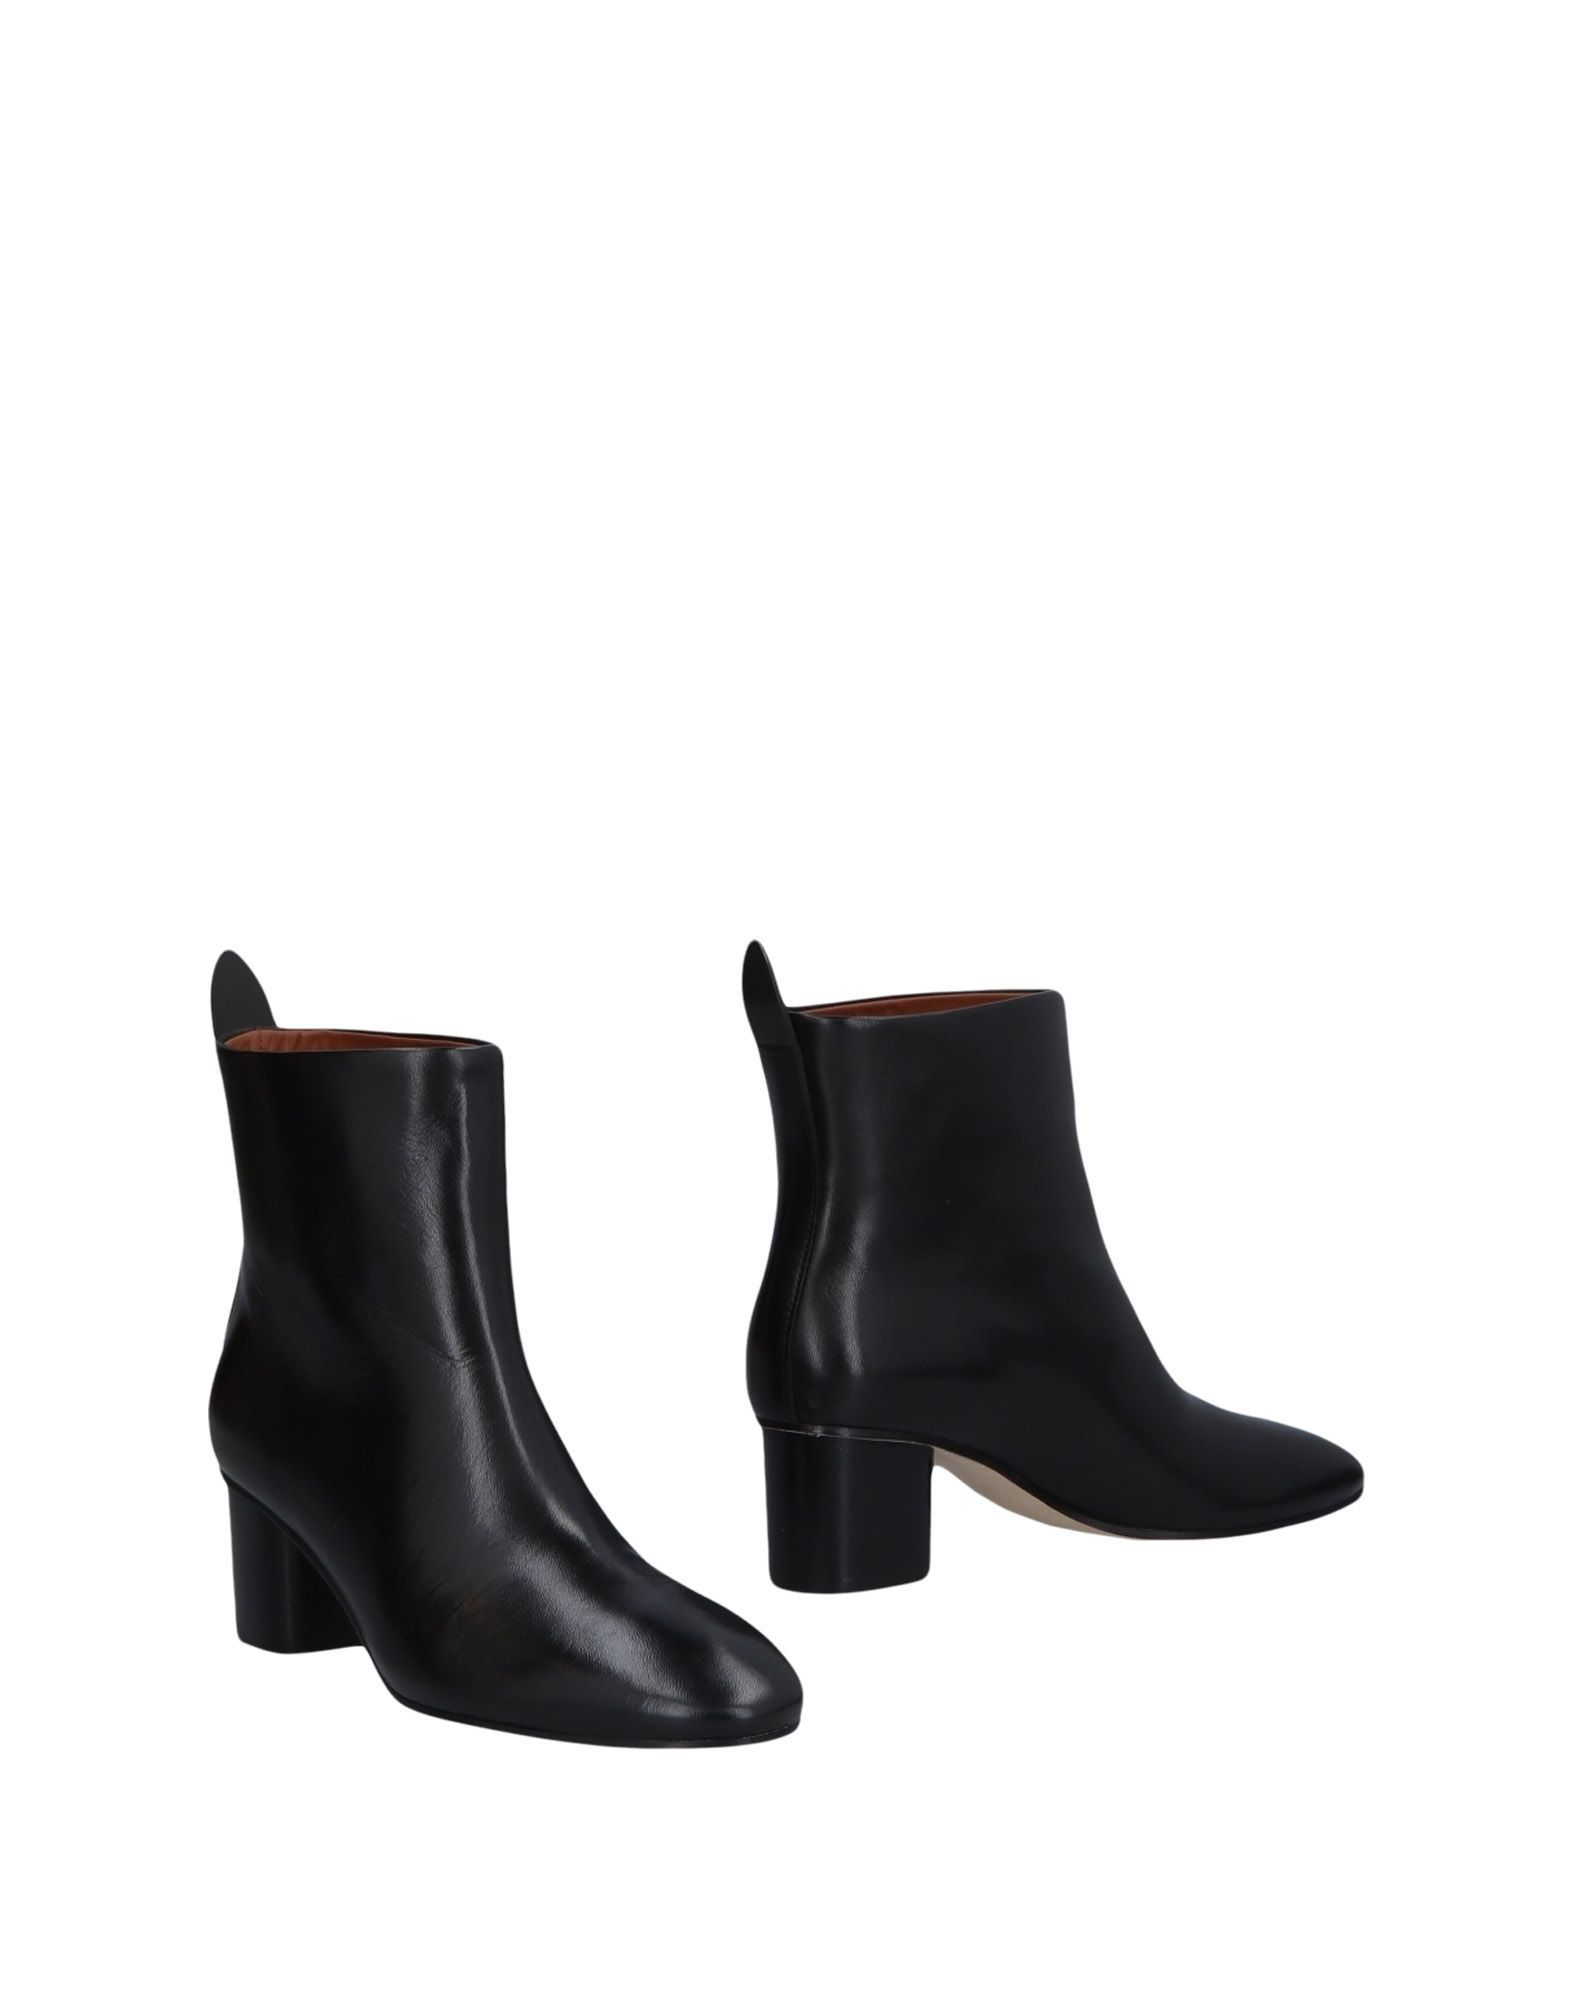 Joseph Black Leather Ankle Boots